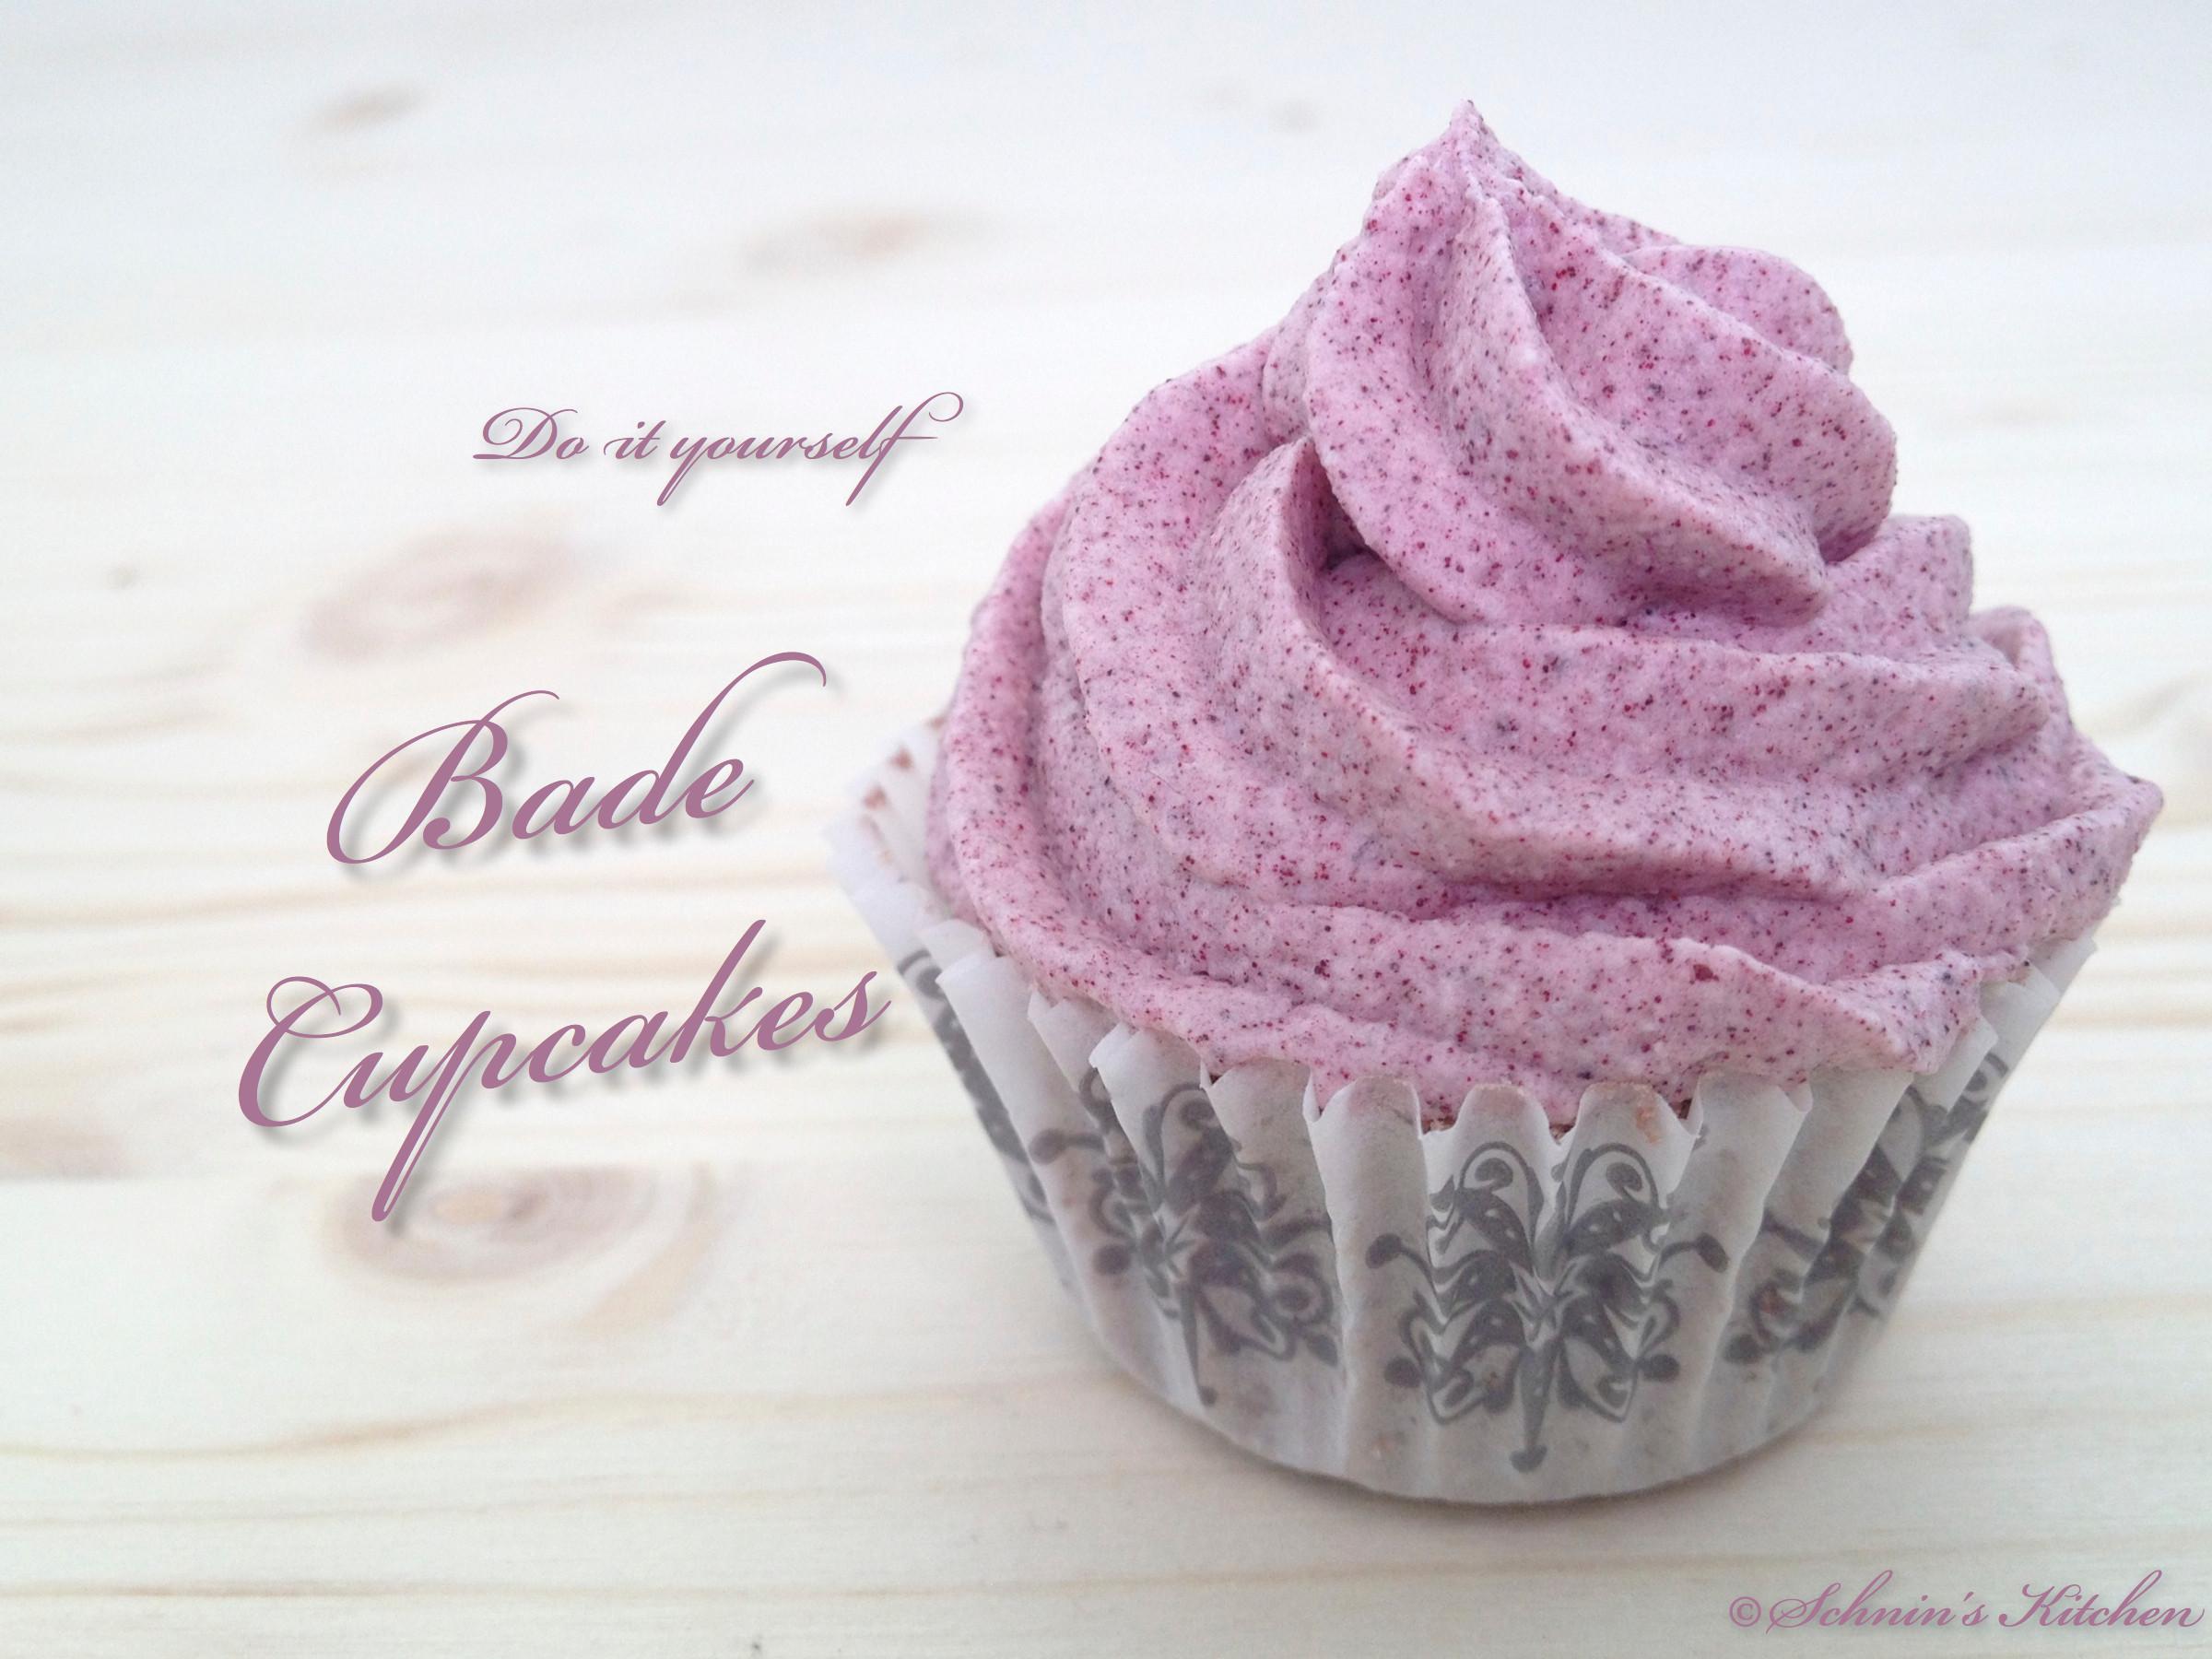 Badekugeln Diy  DIY Bade en Cupcakes für babyzarte Haut Schnin s